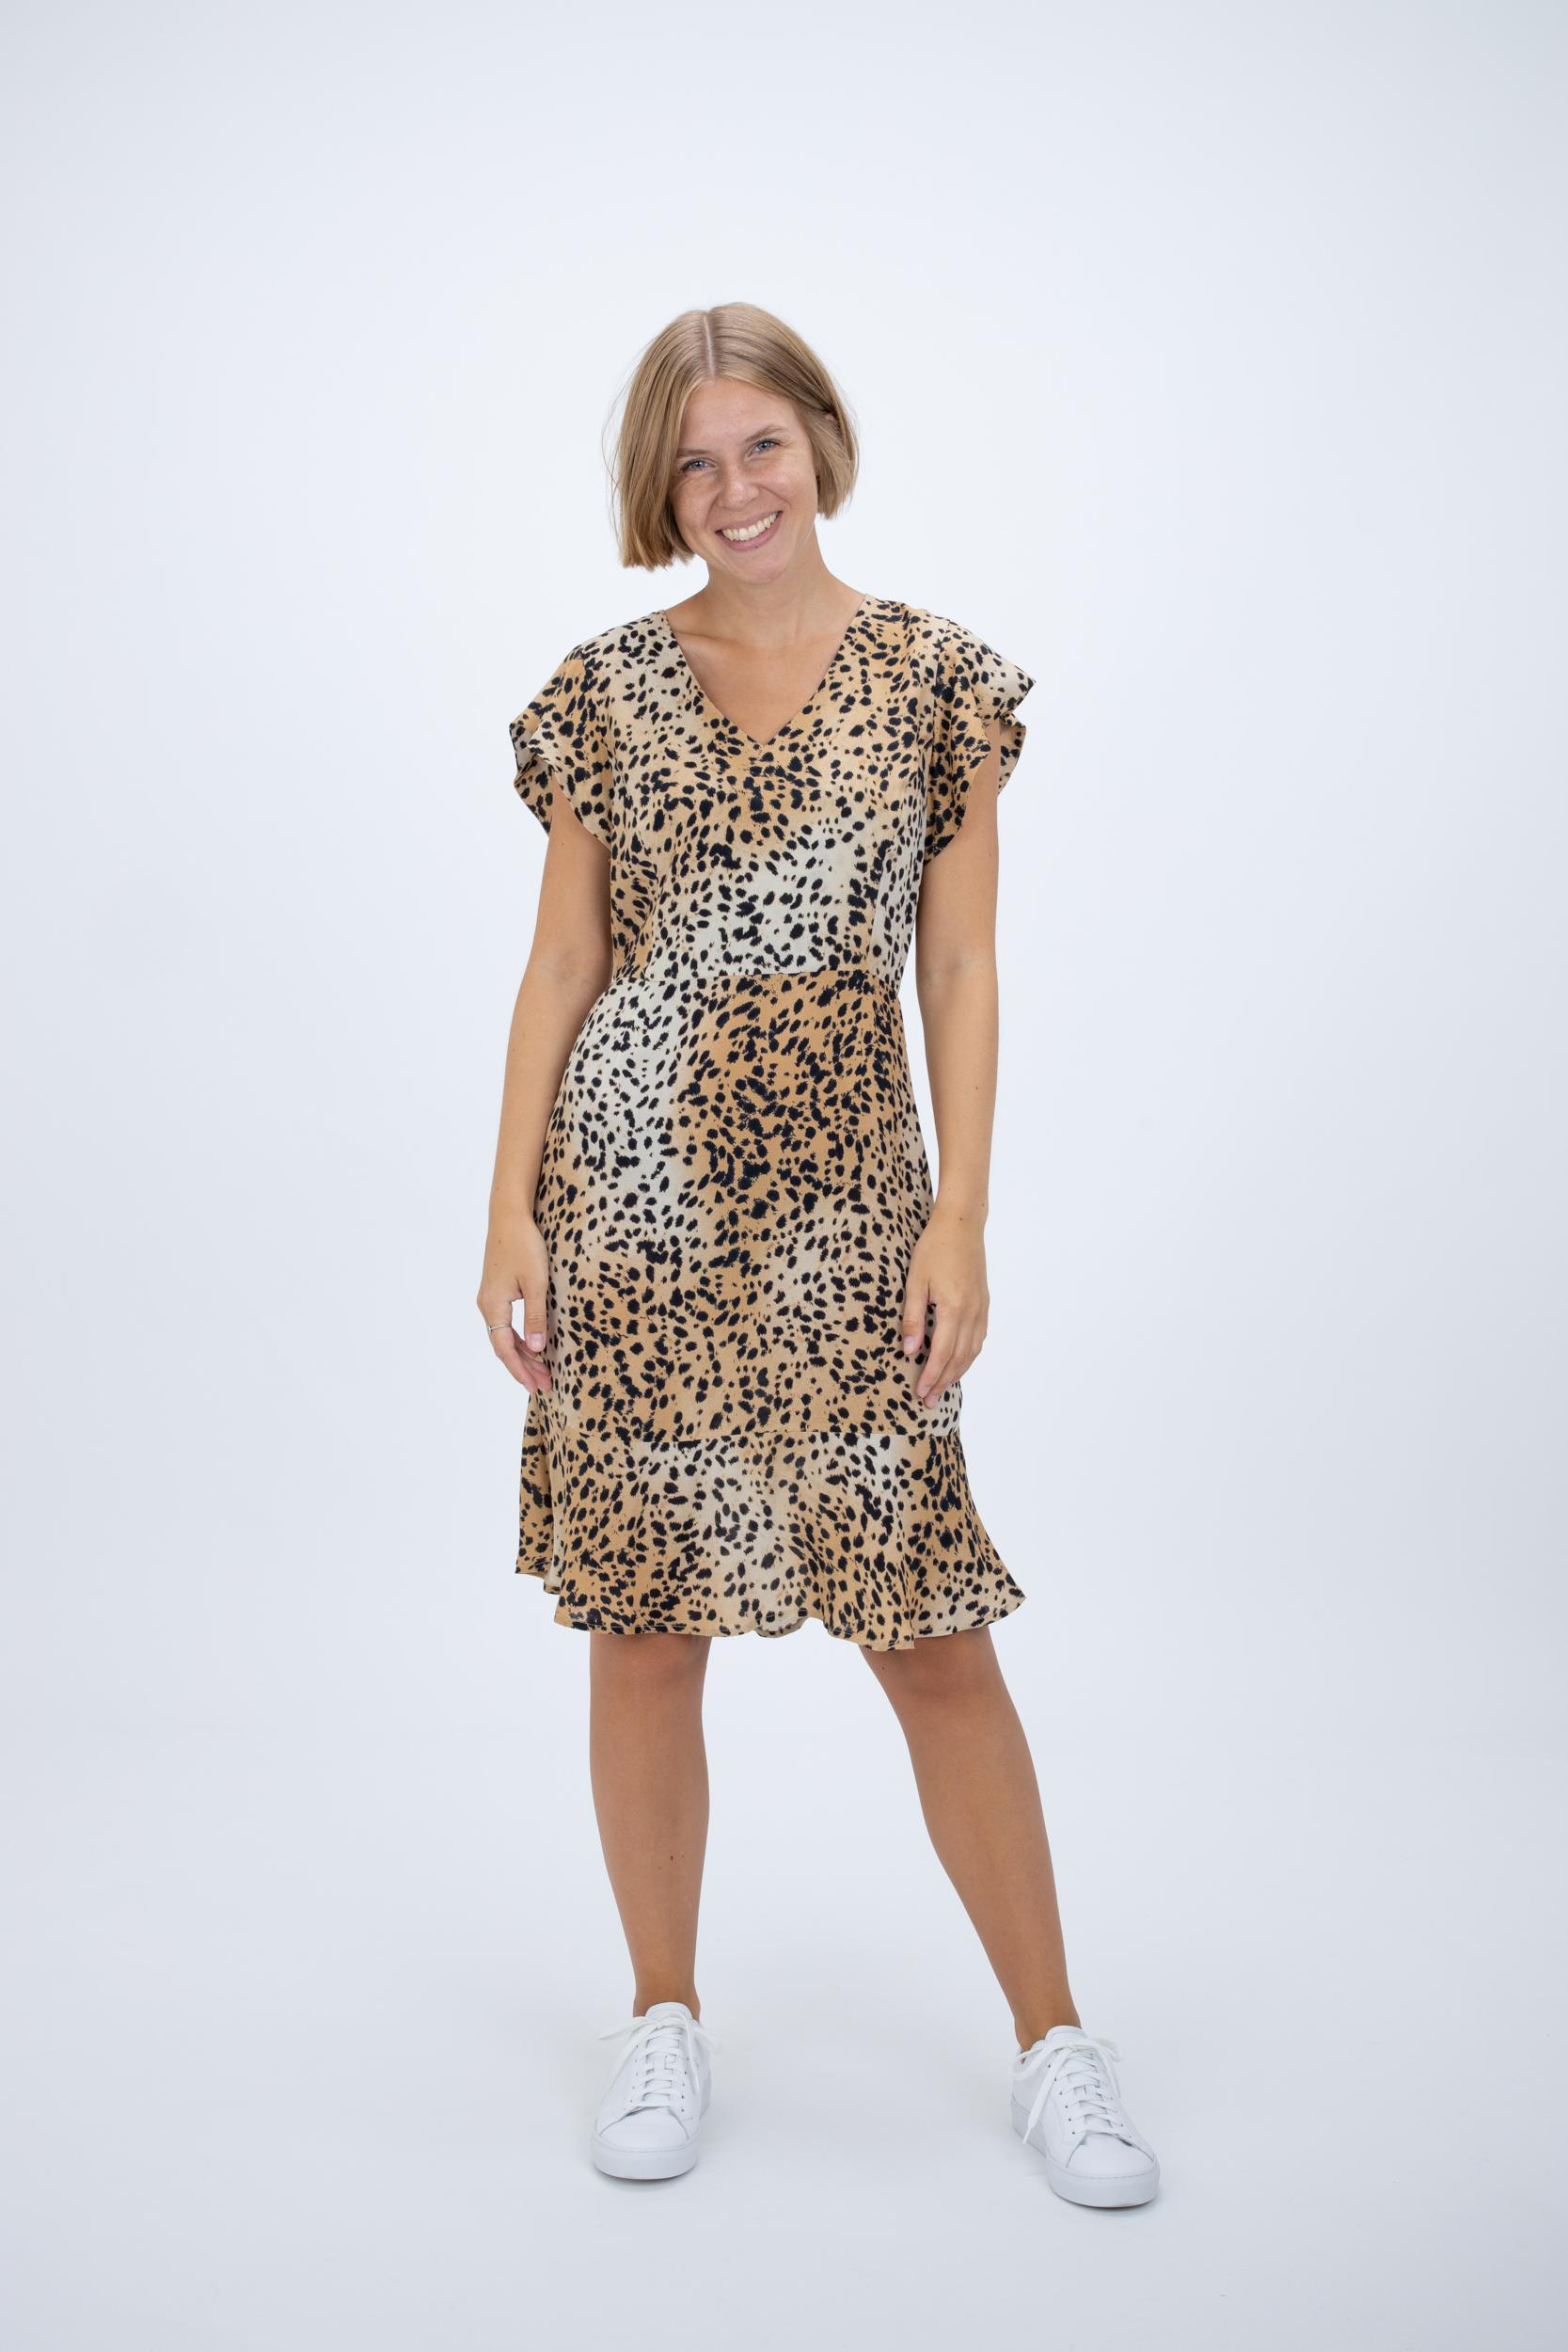 Kleid mit Gepardenprint